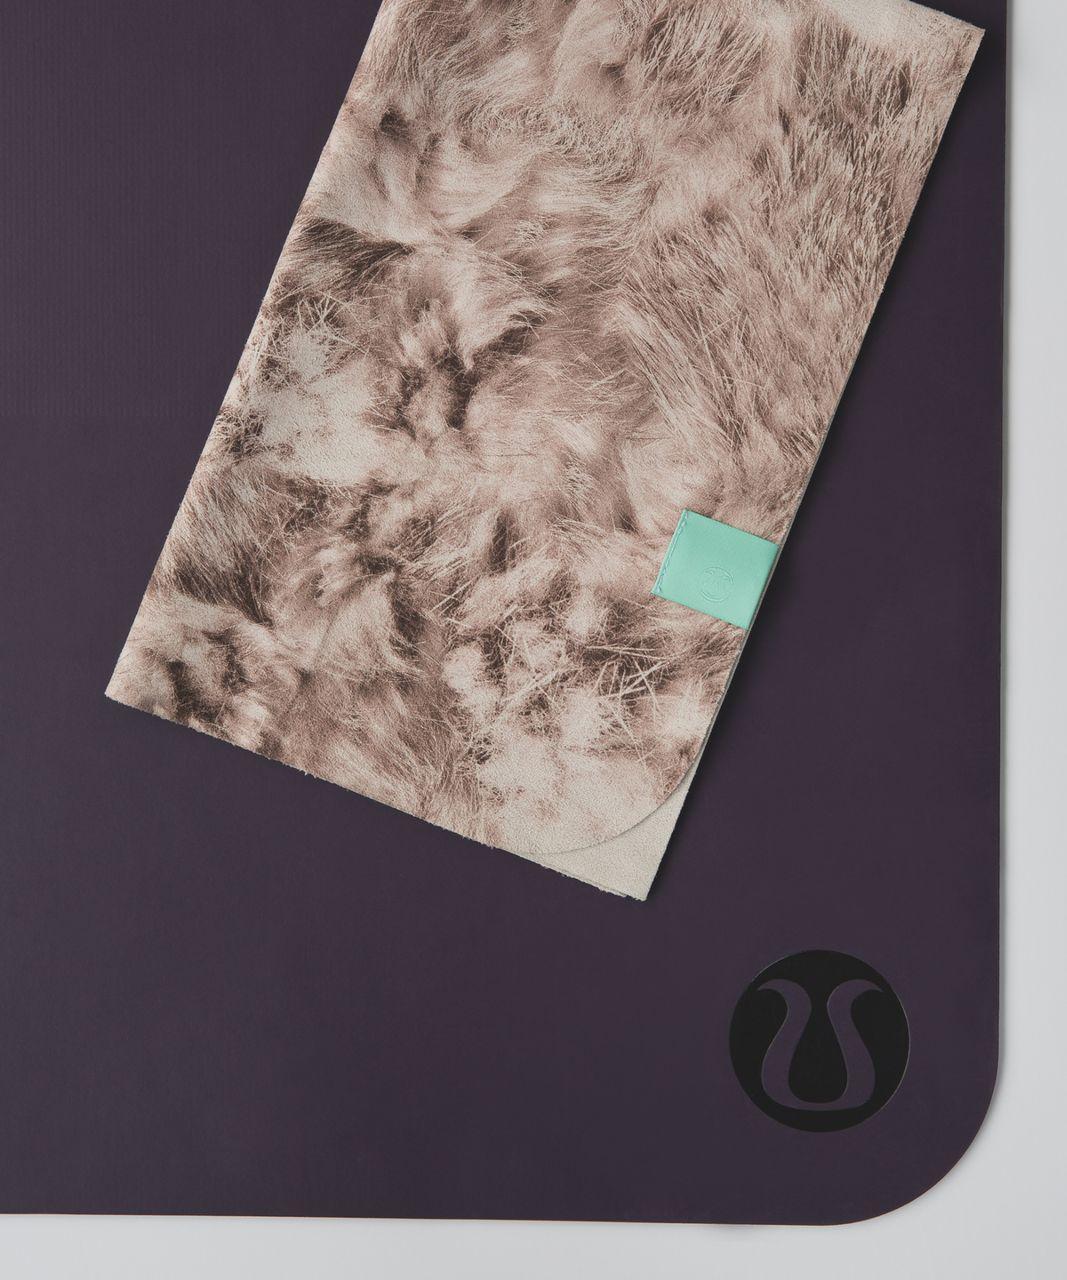 Lululemon The (Small) Towel - Furry Flurry White Tan Multi